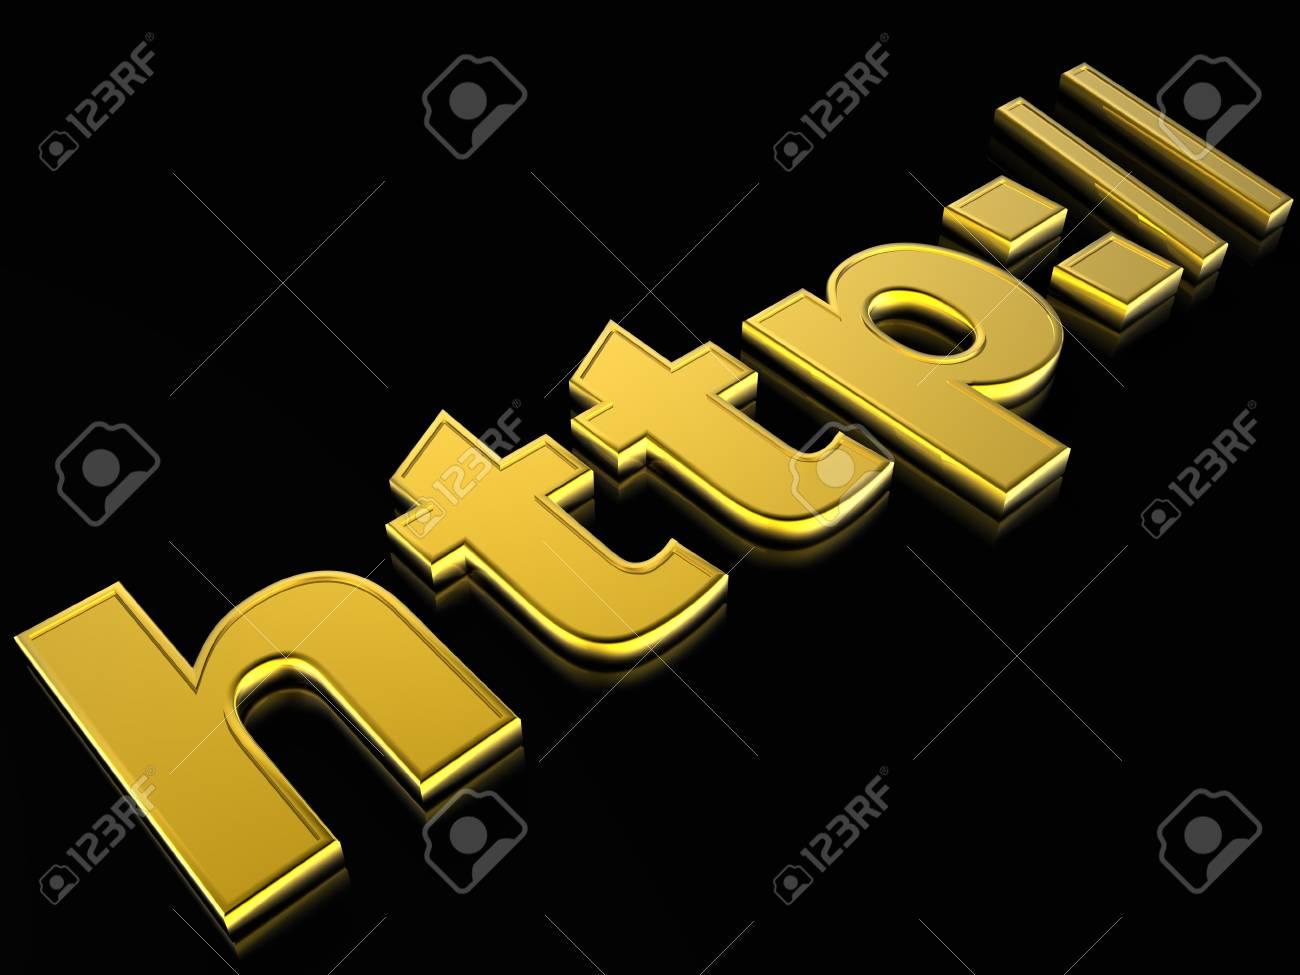 3d illustration internet sign Stock Photo - 4530101